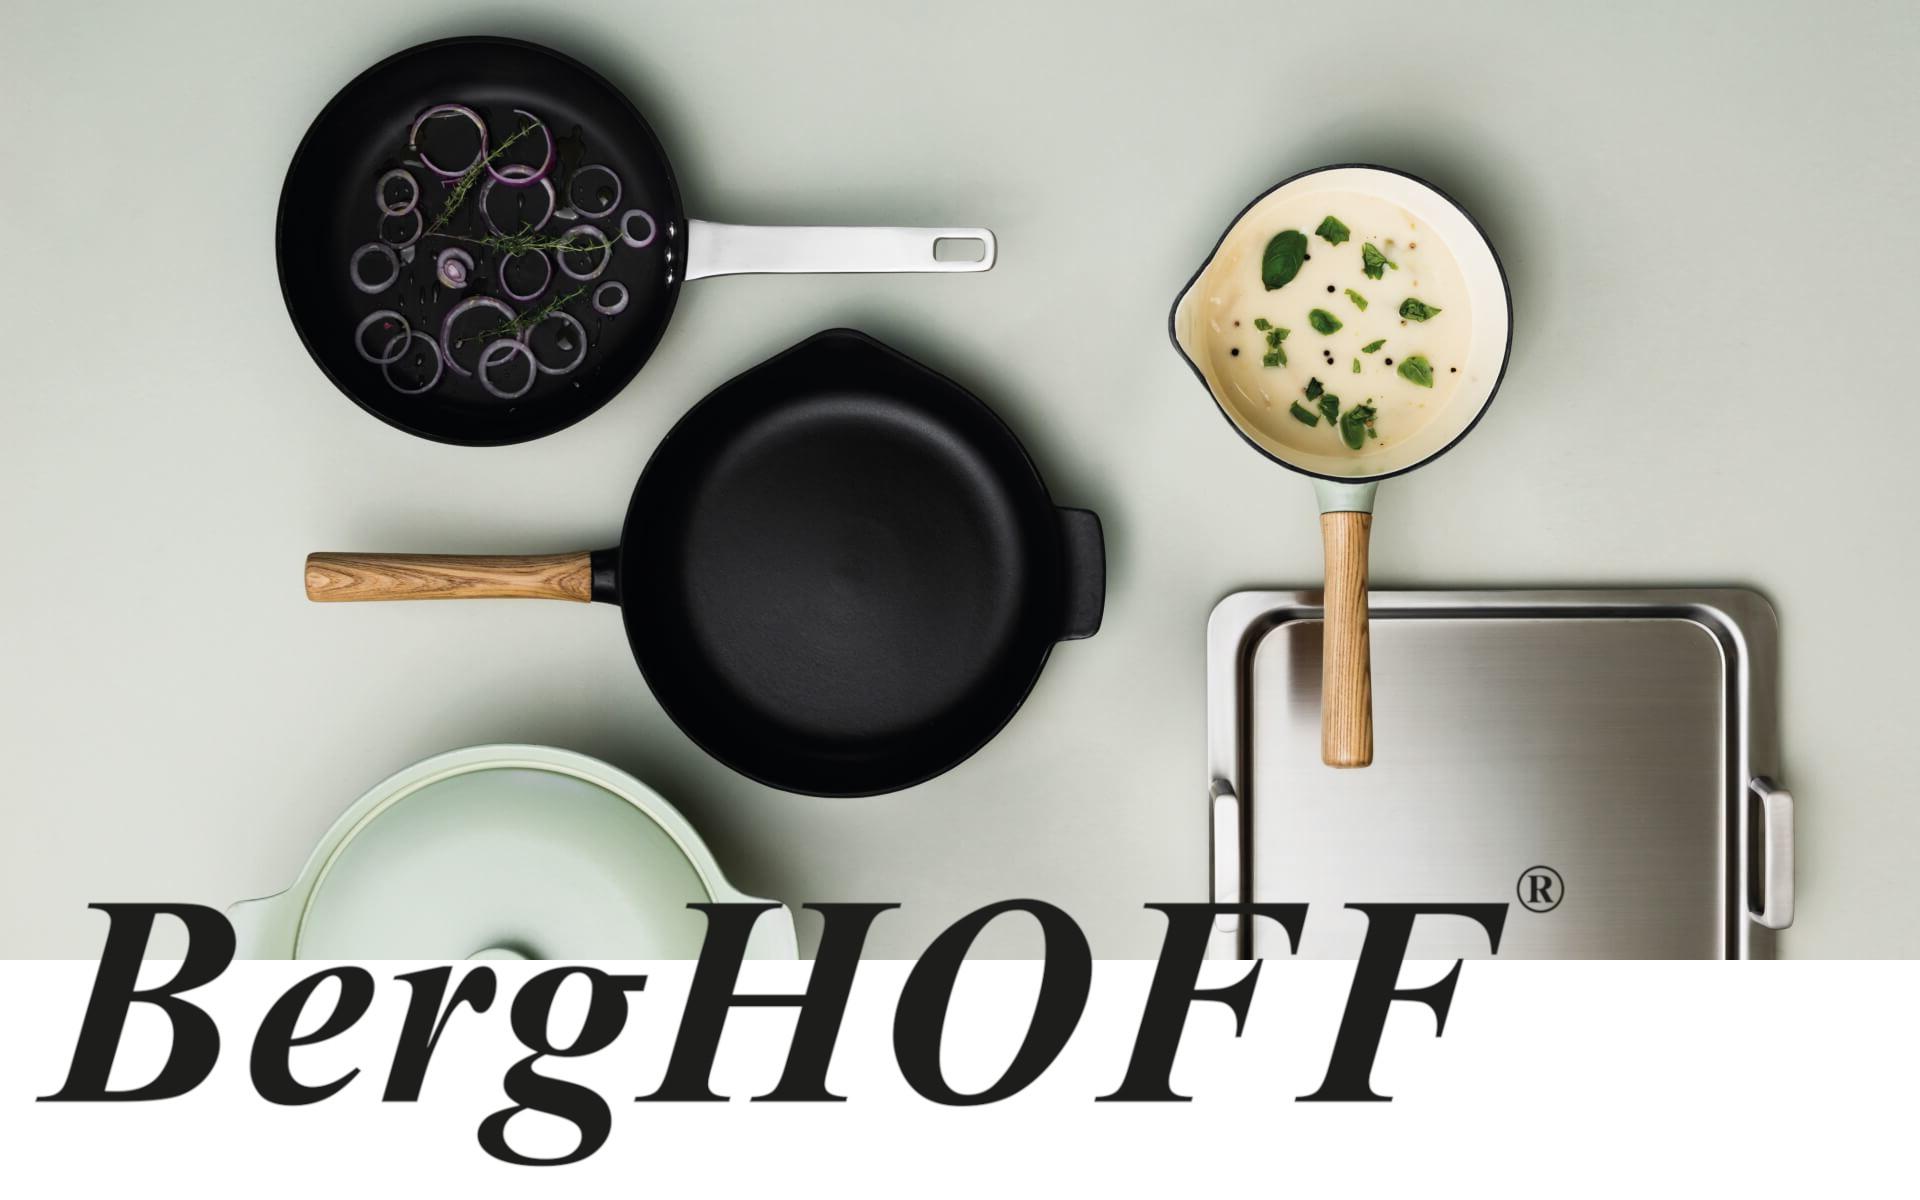 Ustensiles et accessoires de cuisine berghoff